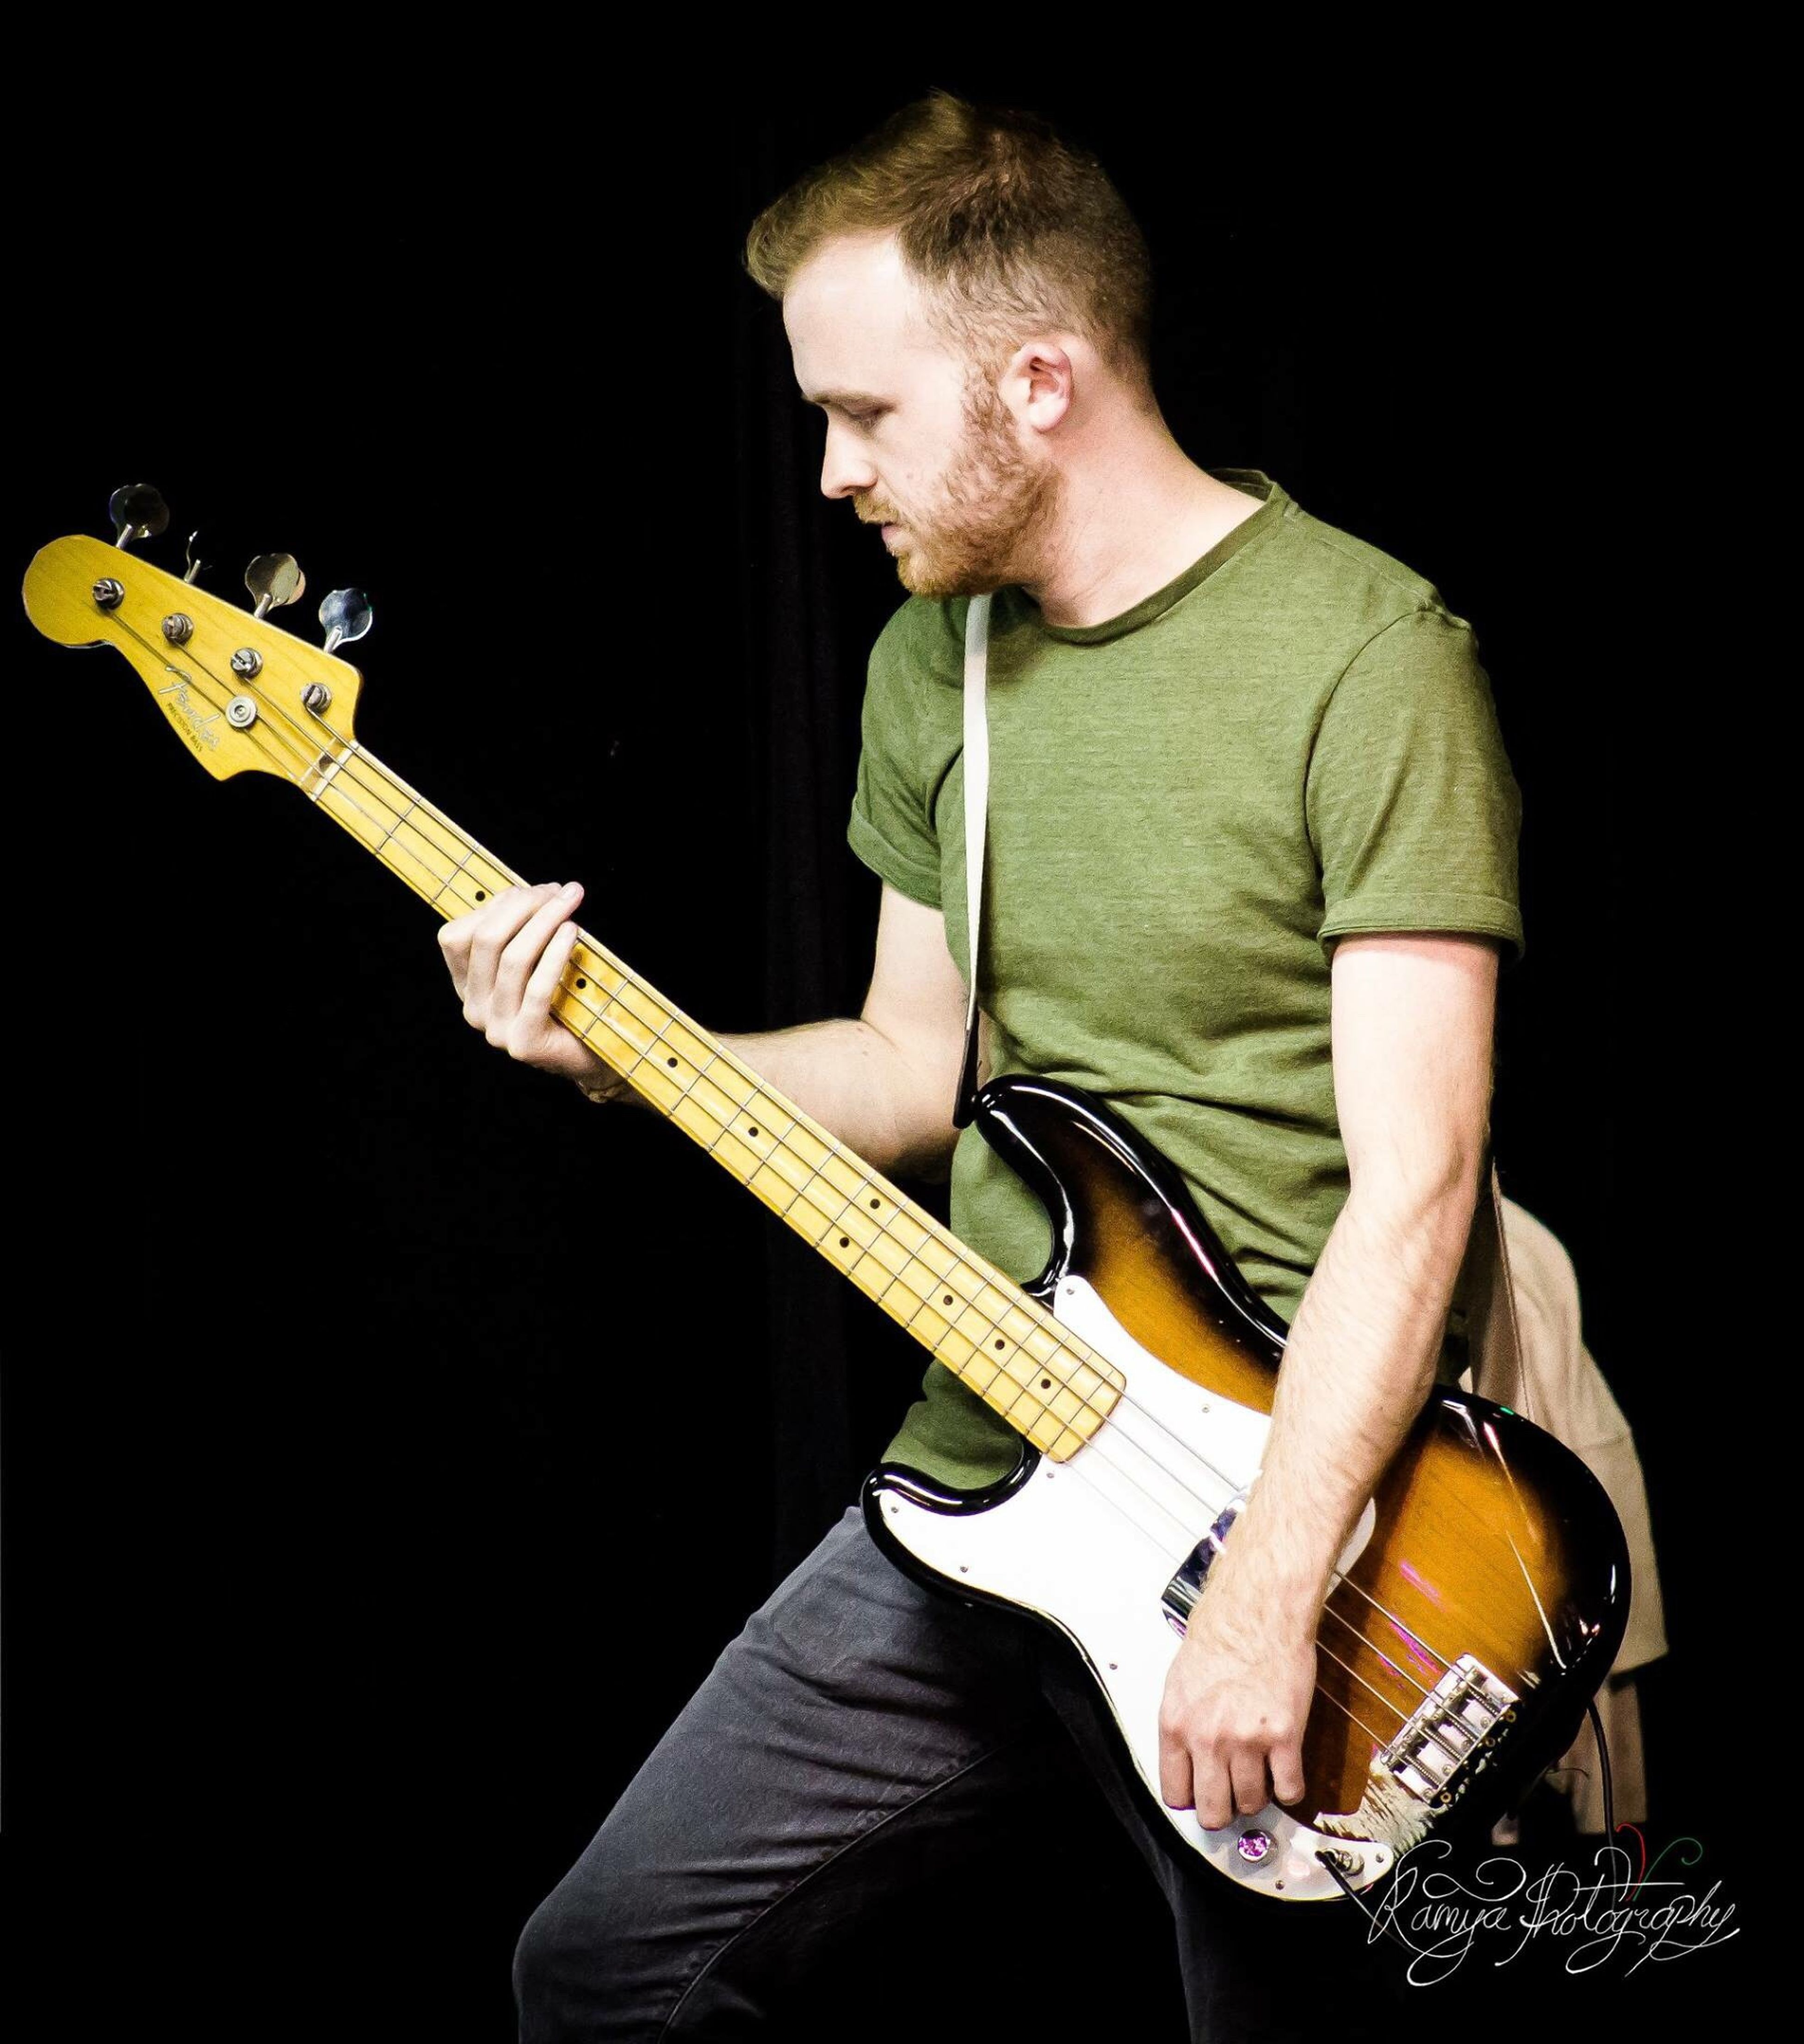 Jordan Carter Kamyaphotography Musicians Music Guitarist Bass Lefthanded Lefthandedguitarist